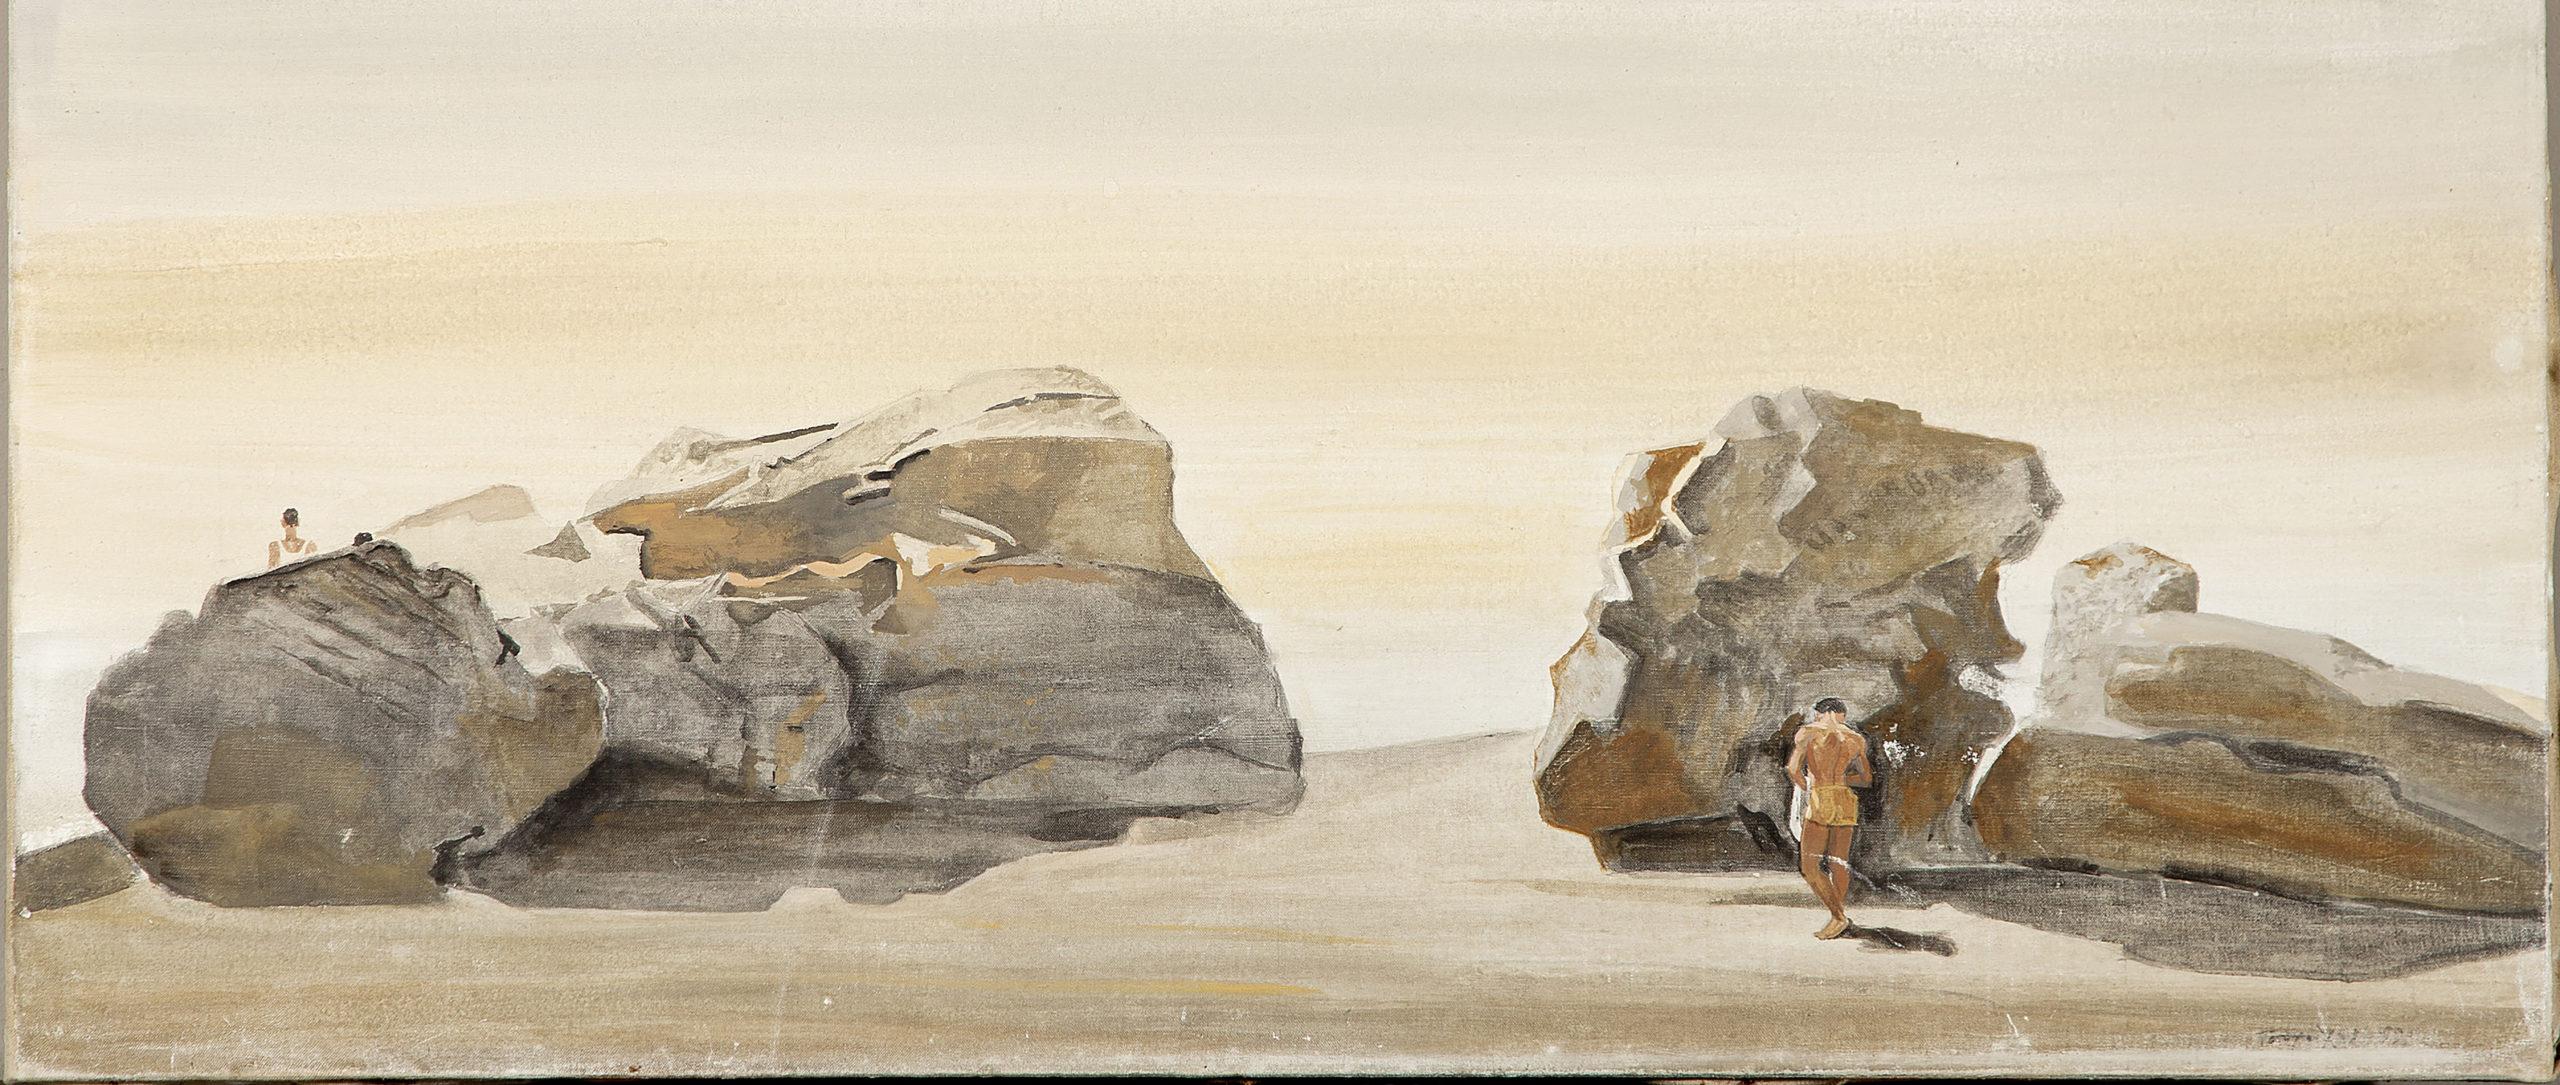 Beach Rocks with Two Figures, St. Jean Cap Ferrat, Yannis Tsarouchis 1959